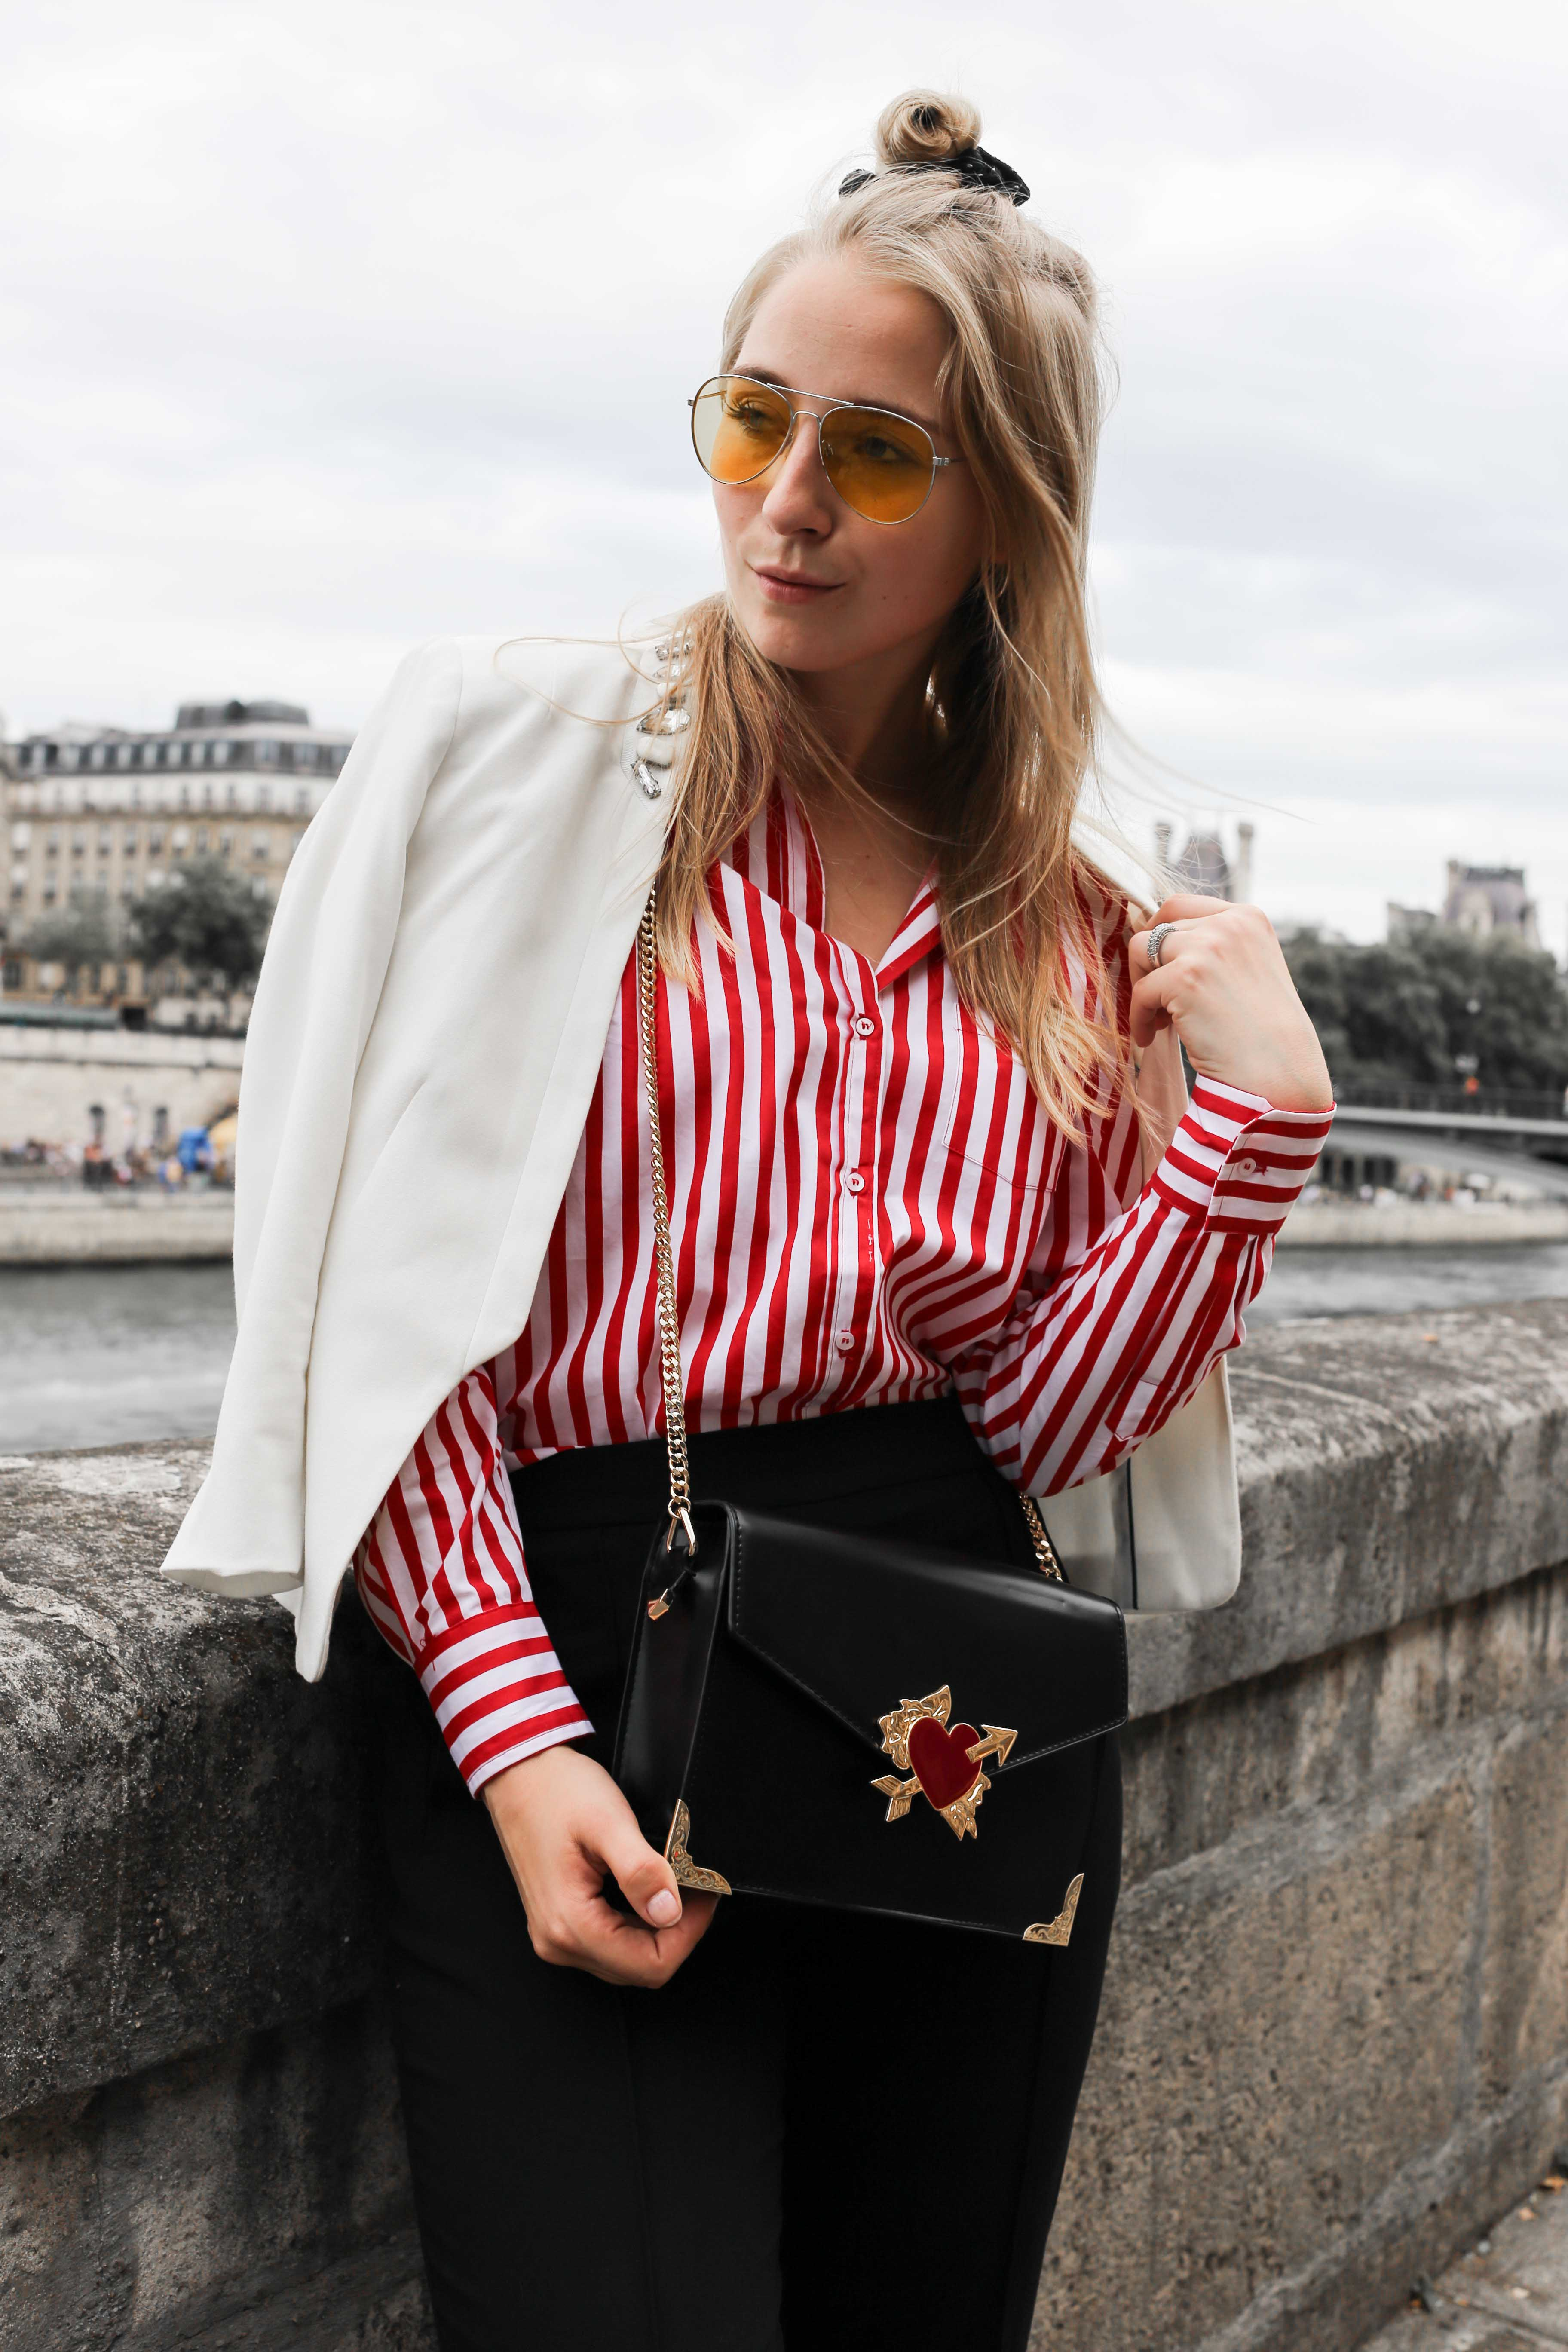 rote-mokassins-streifenbluse-weißer-blazer-paris-modeblog-fashionblog-fashion-blog_1477